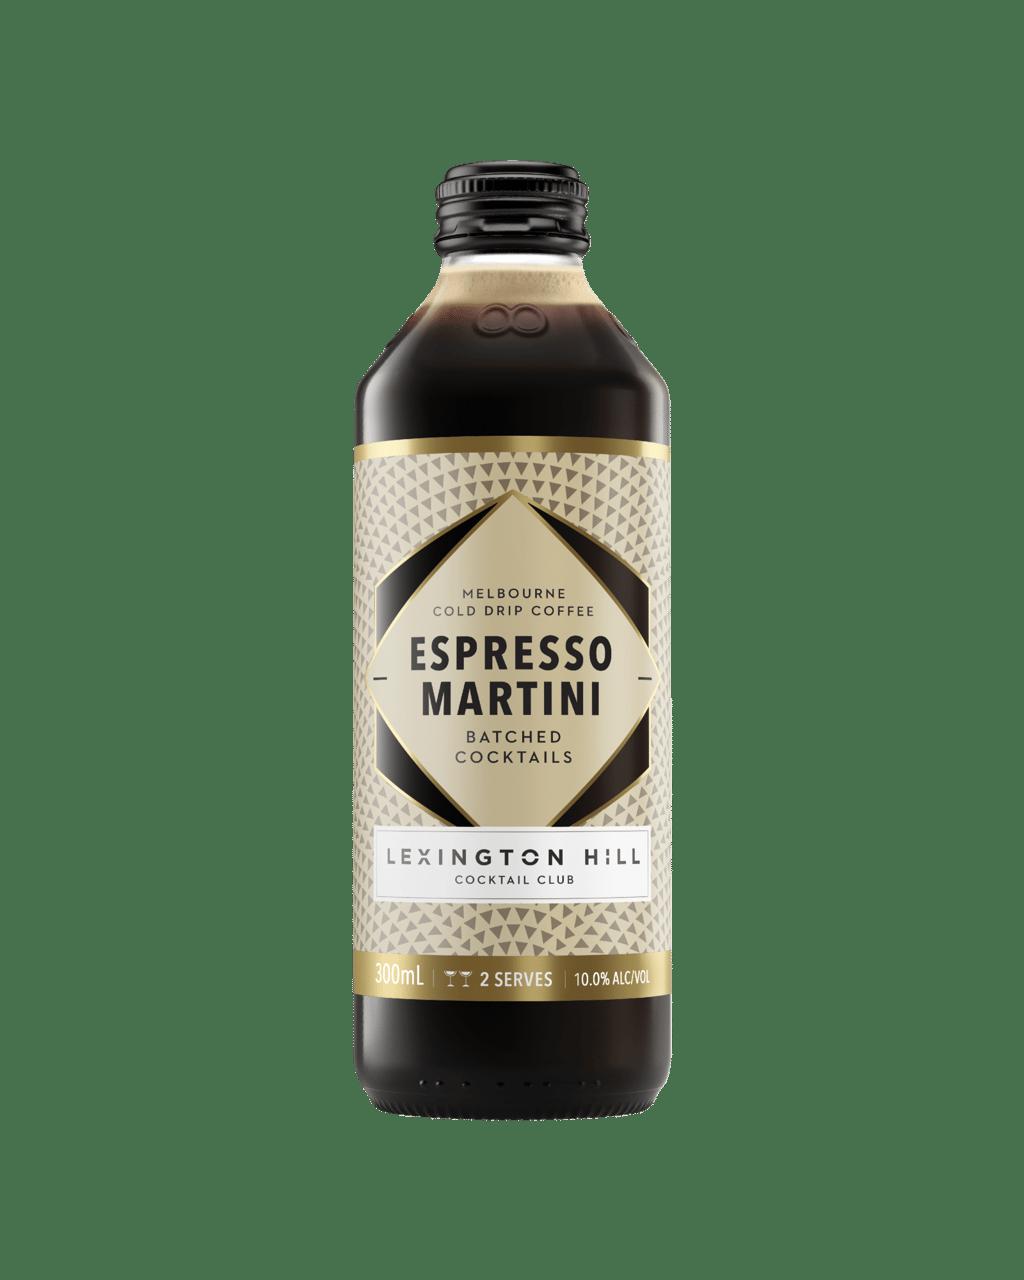 Buy Lexington Hill Cocktail Club Espresso Martini 300ml Dan Murphy S Delivers